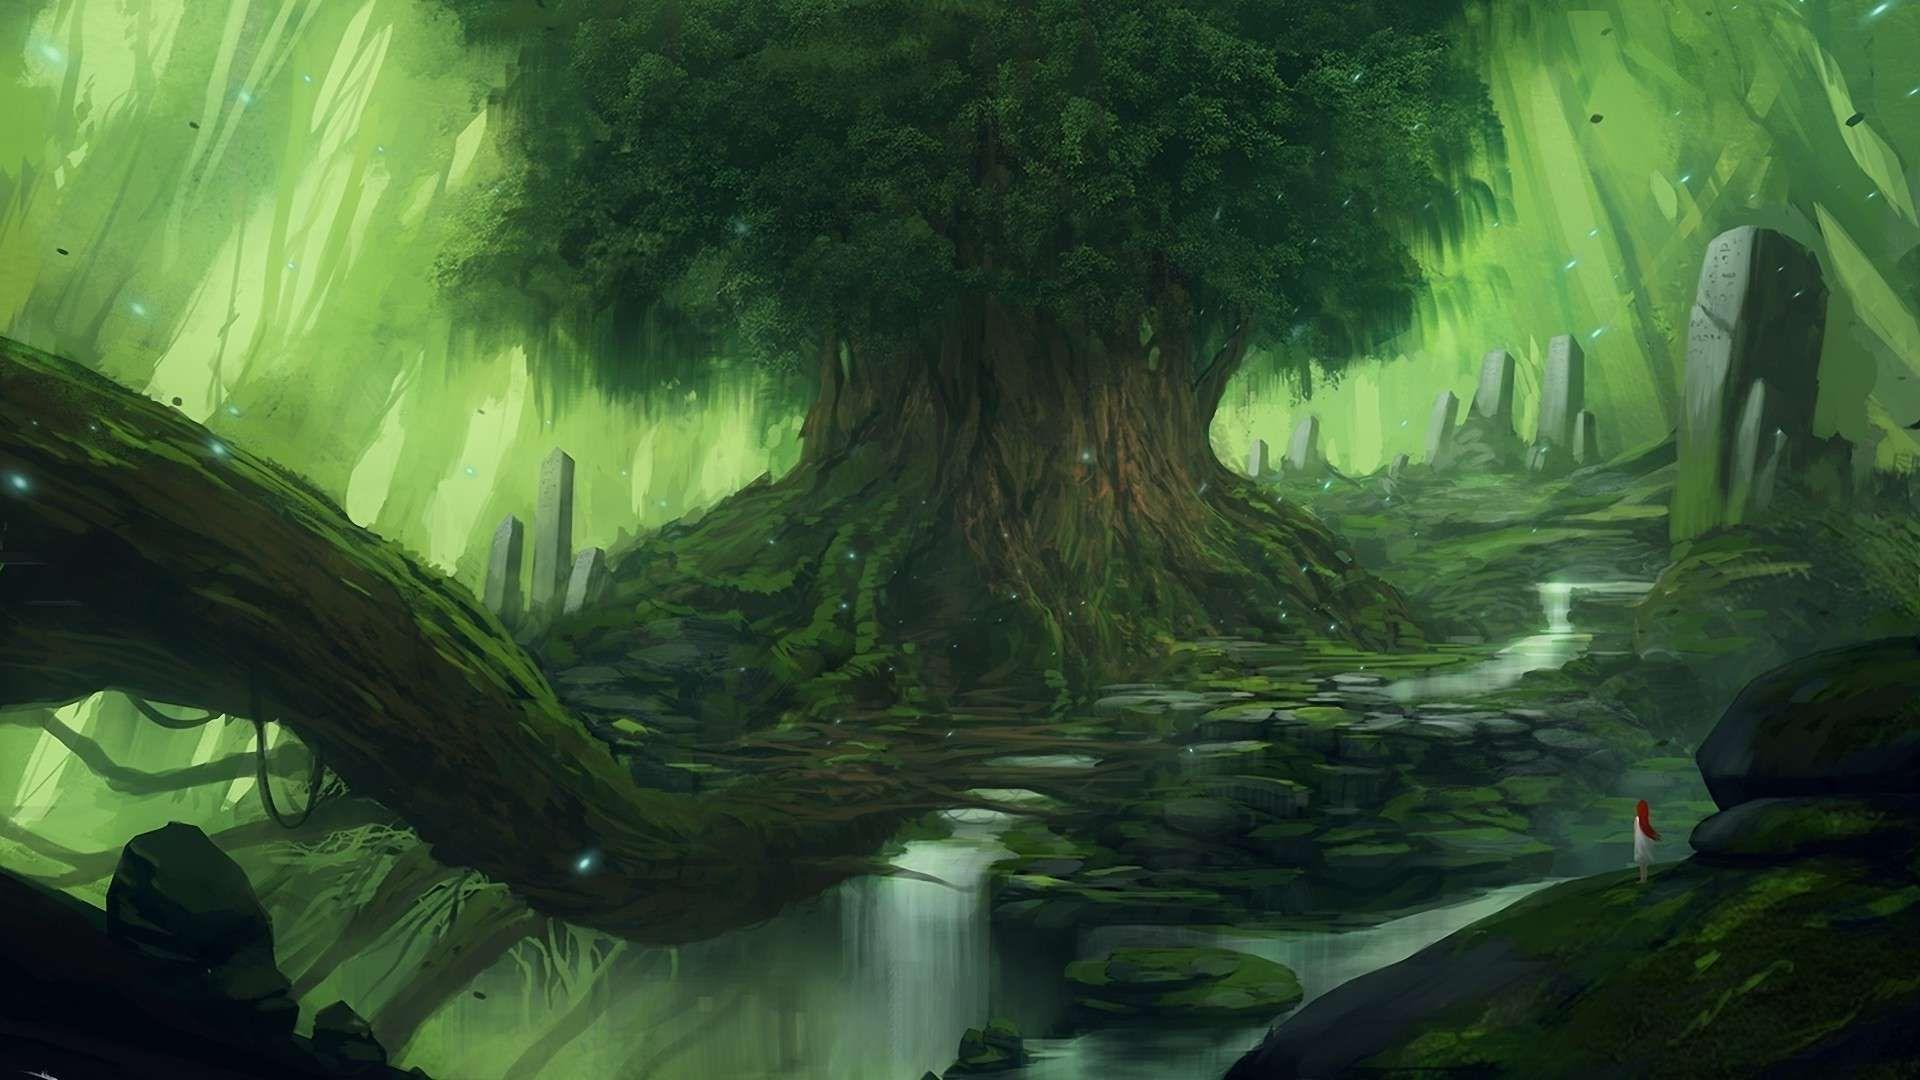 fantasy forest wallpaper images #tdh4b ~ wallove | fantasy